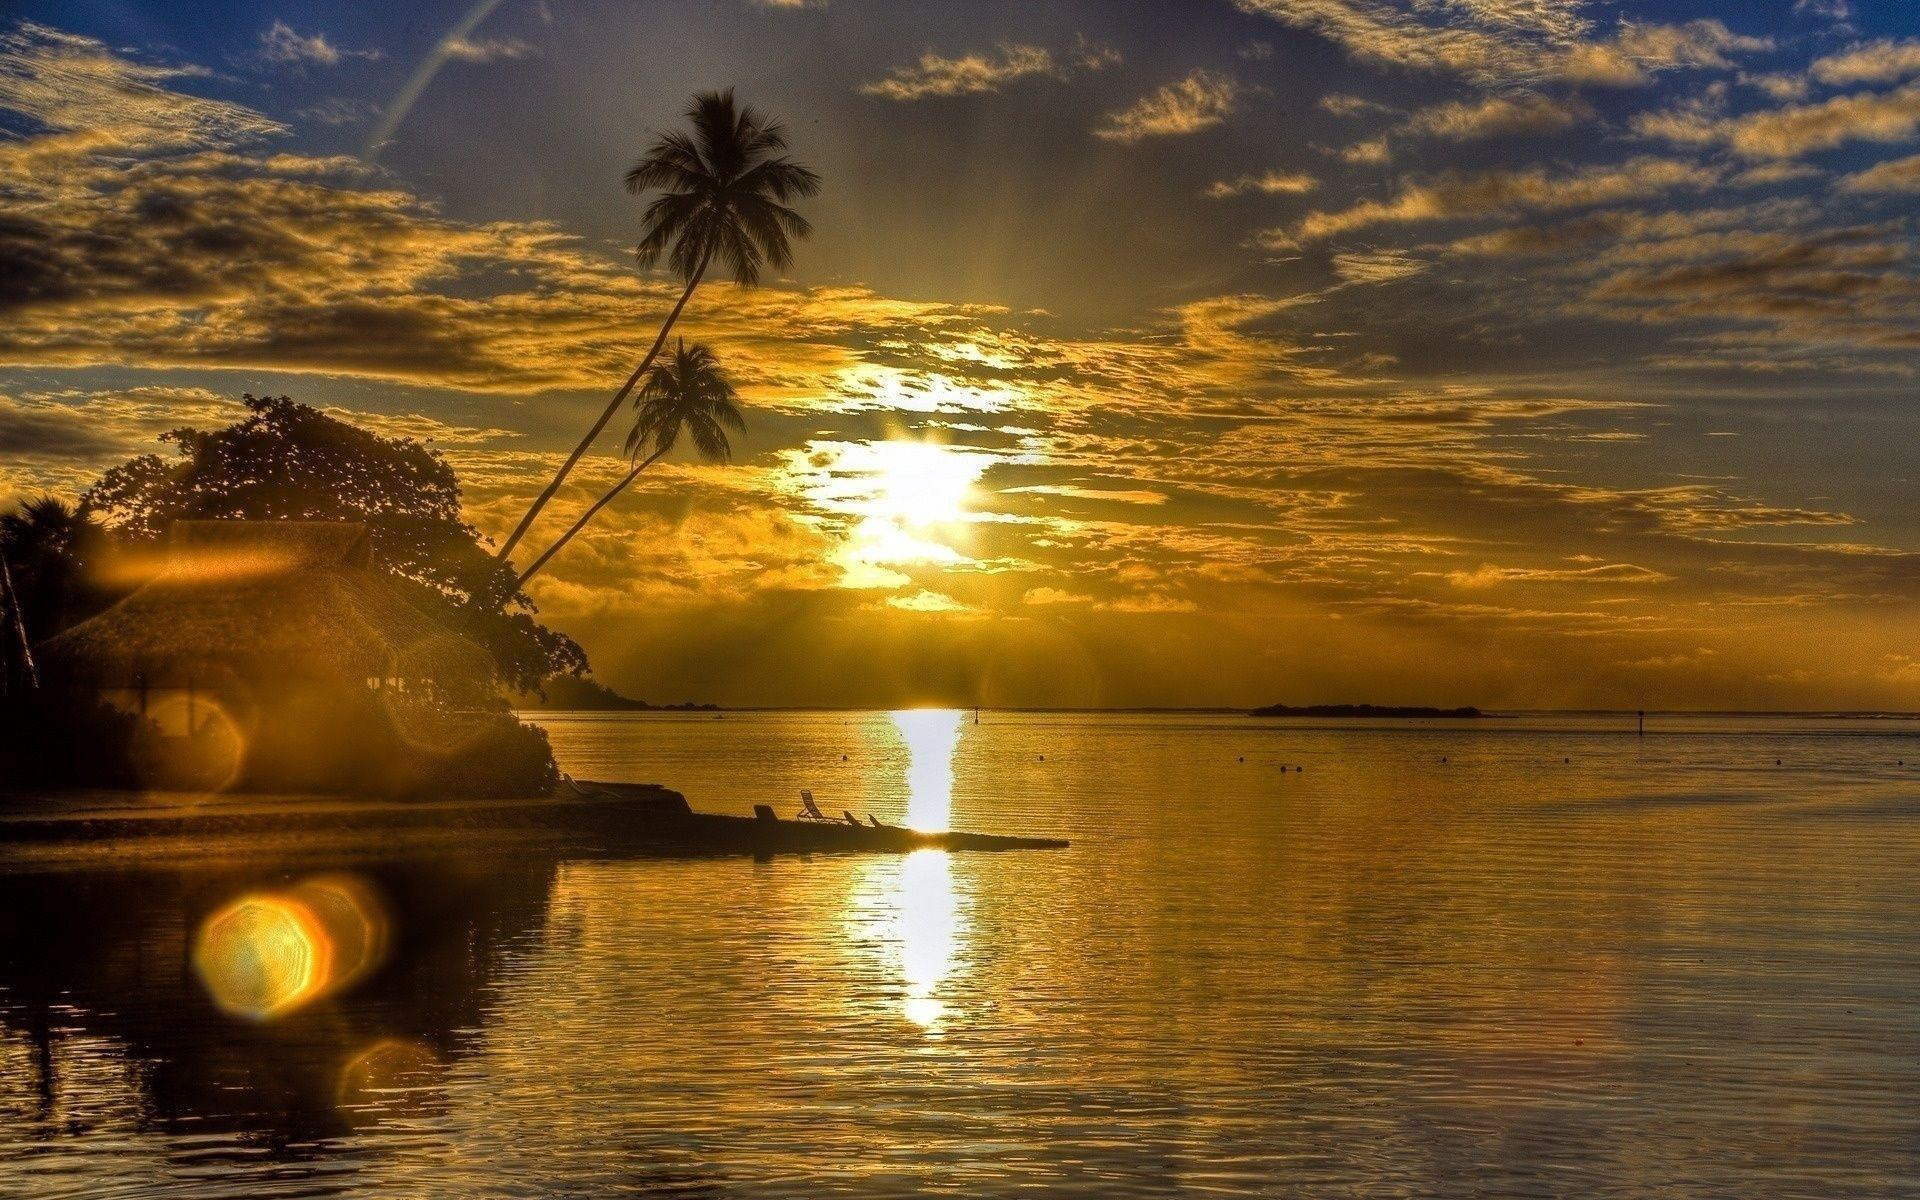 Beautiful Sunrise Captions For Instagram